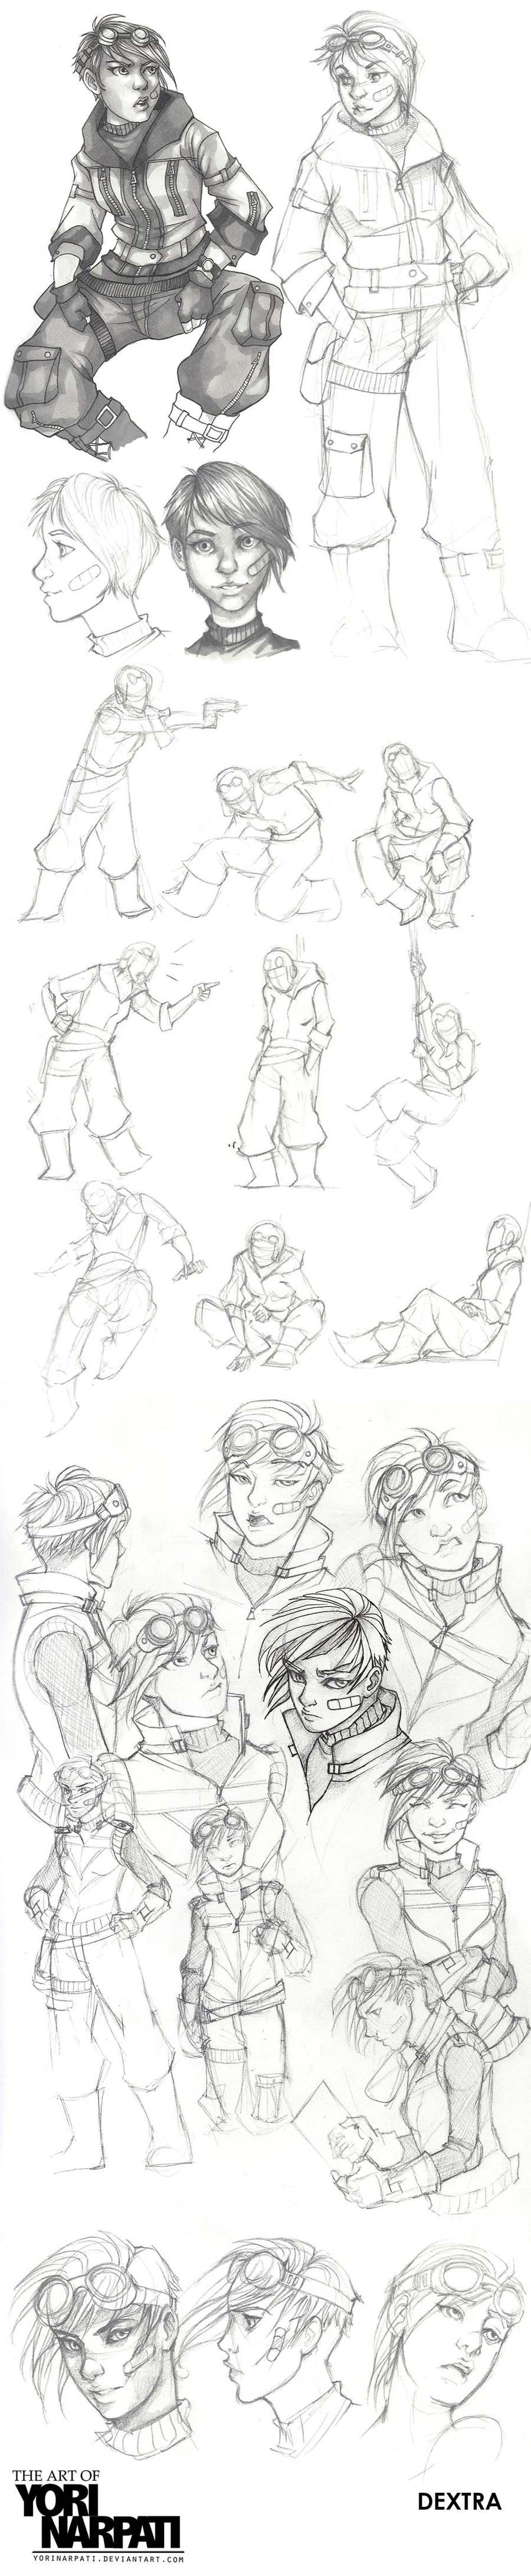 Dextra Character Design by YoriNarpati